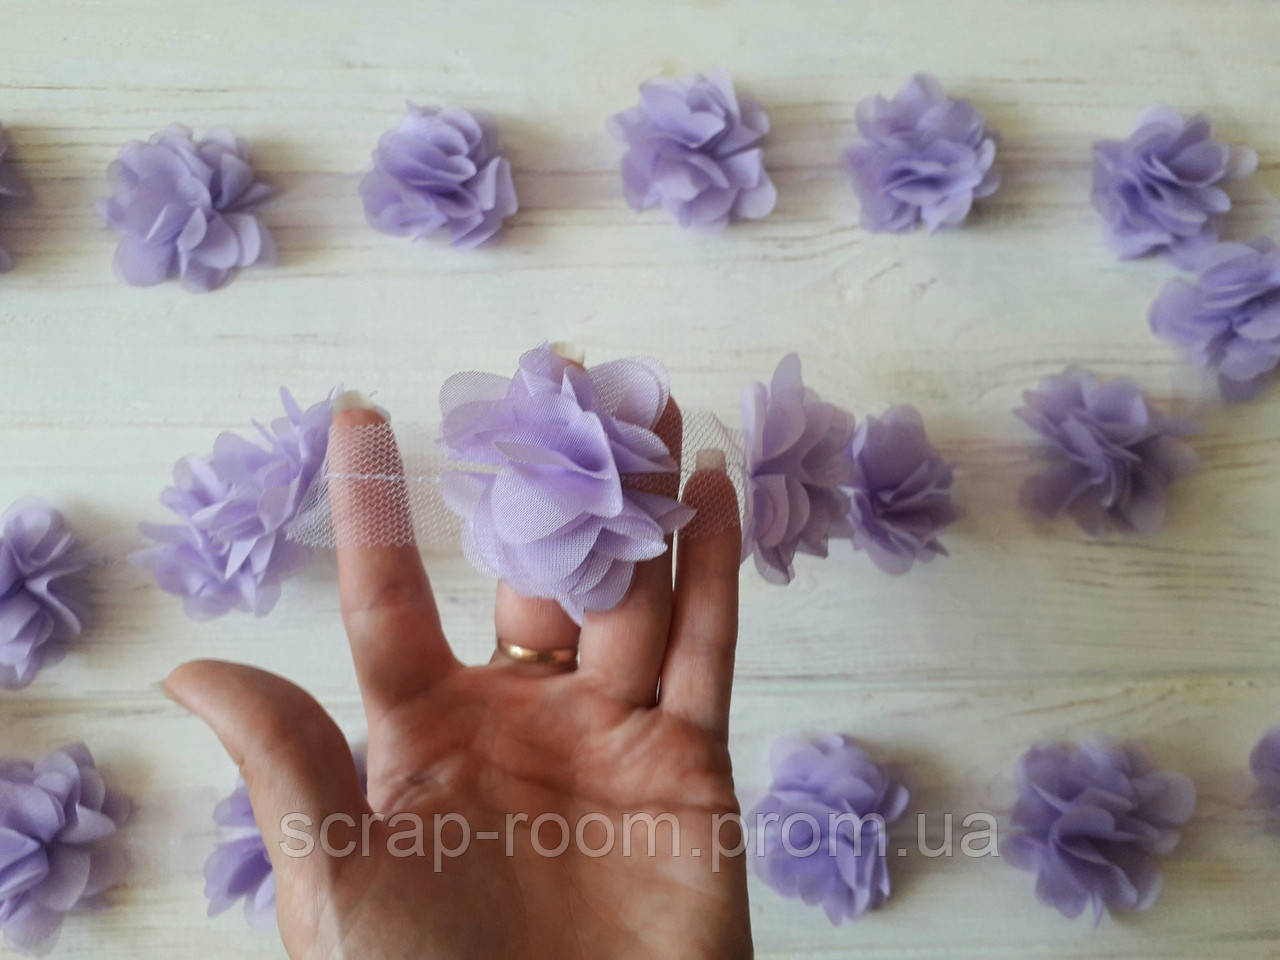 Цветы шифон на ленте фиолетовый, цветок шифоновый сирень 5 см диаметр, шифон цветы, цена указана за  5 шт